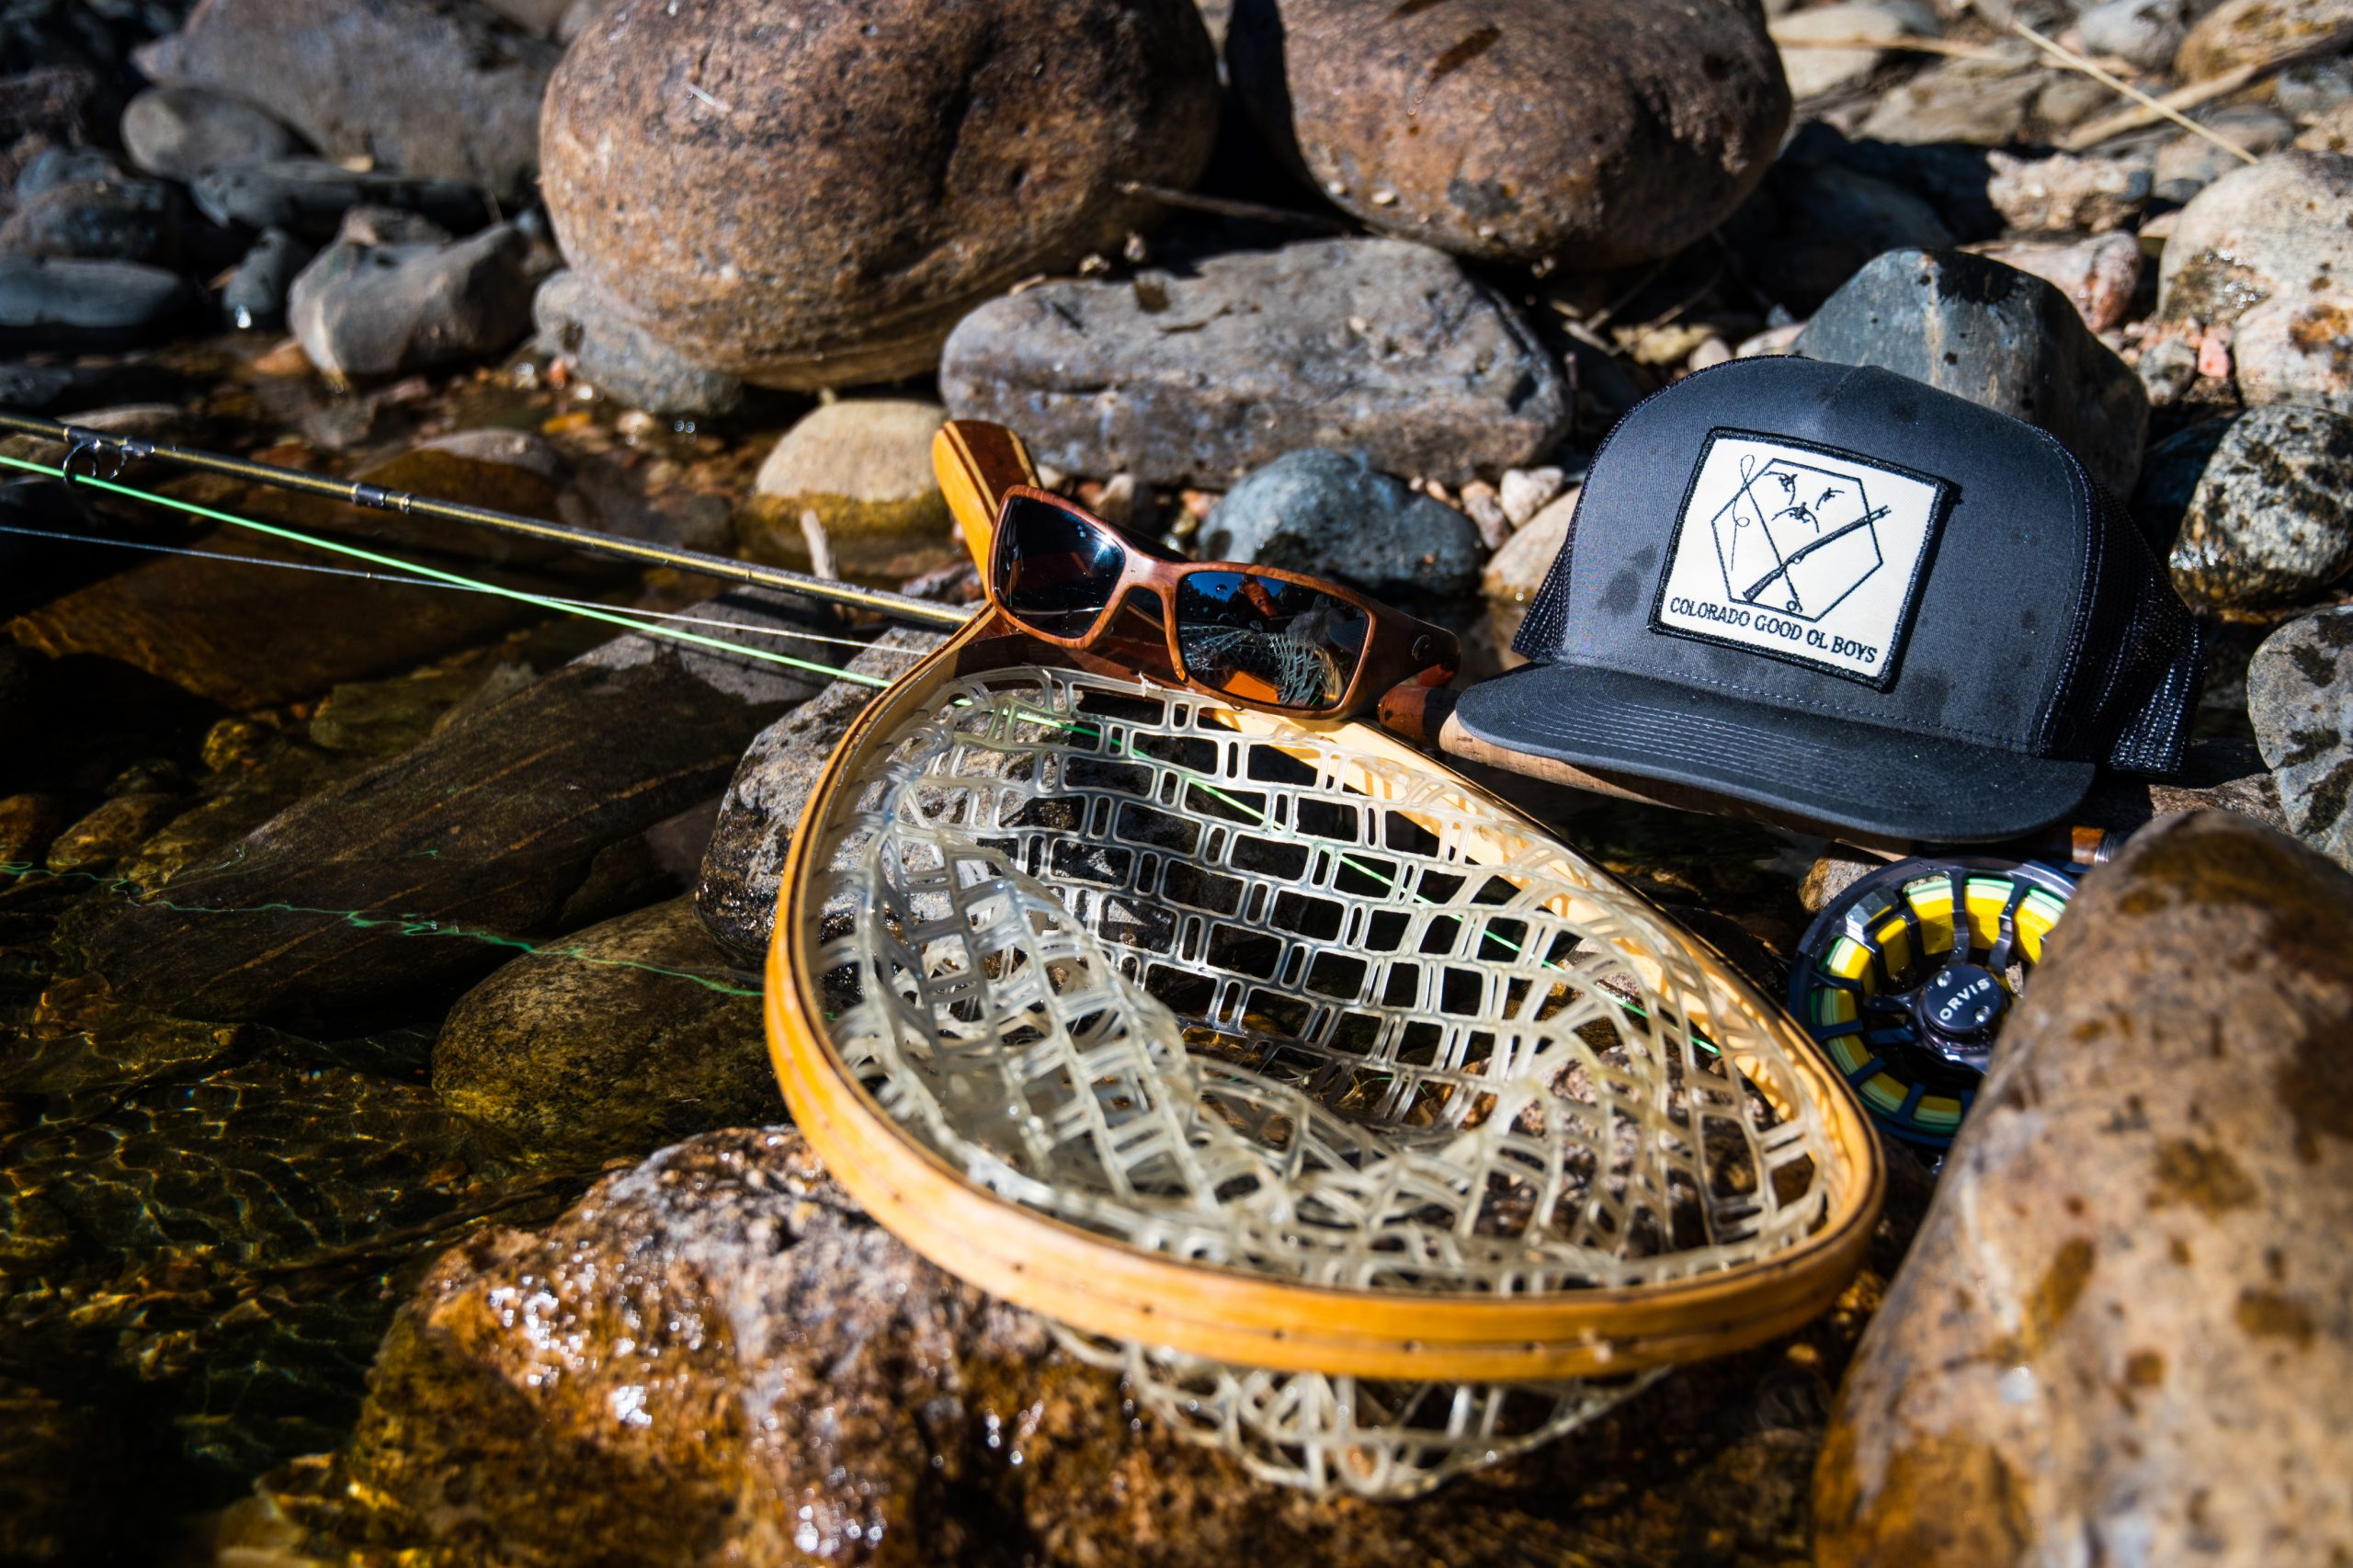 Fly fishing gear for beginners. Fly fishing. Fishing 88